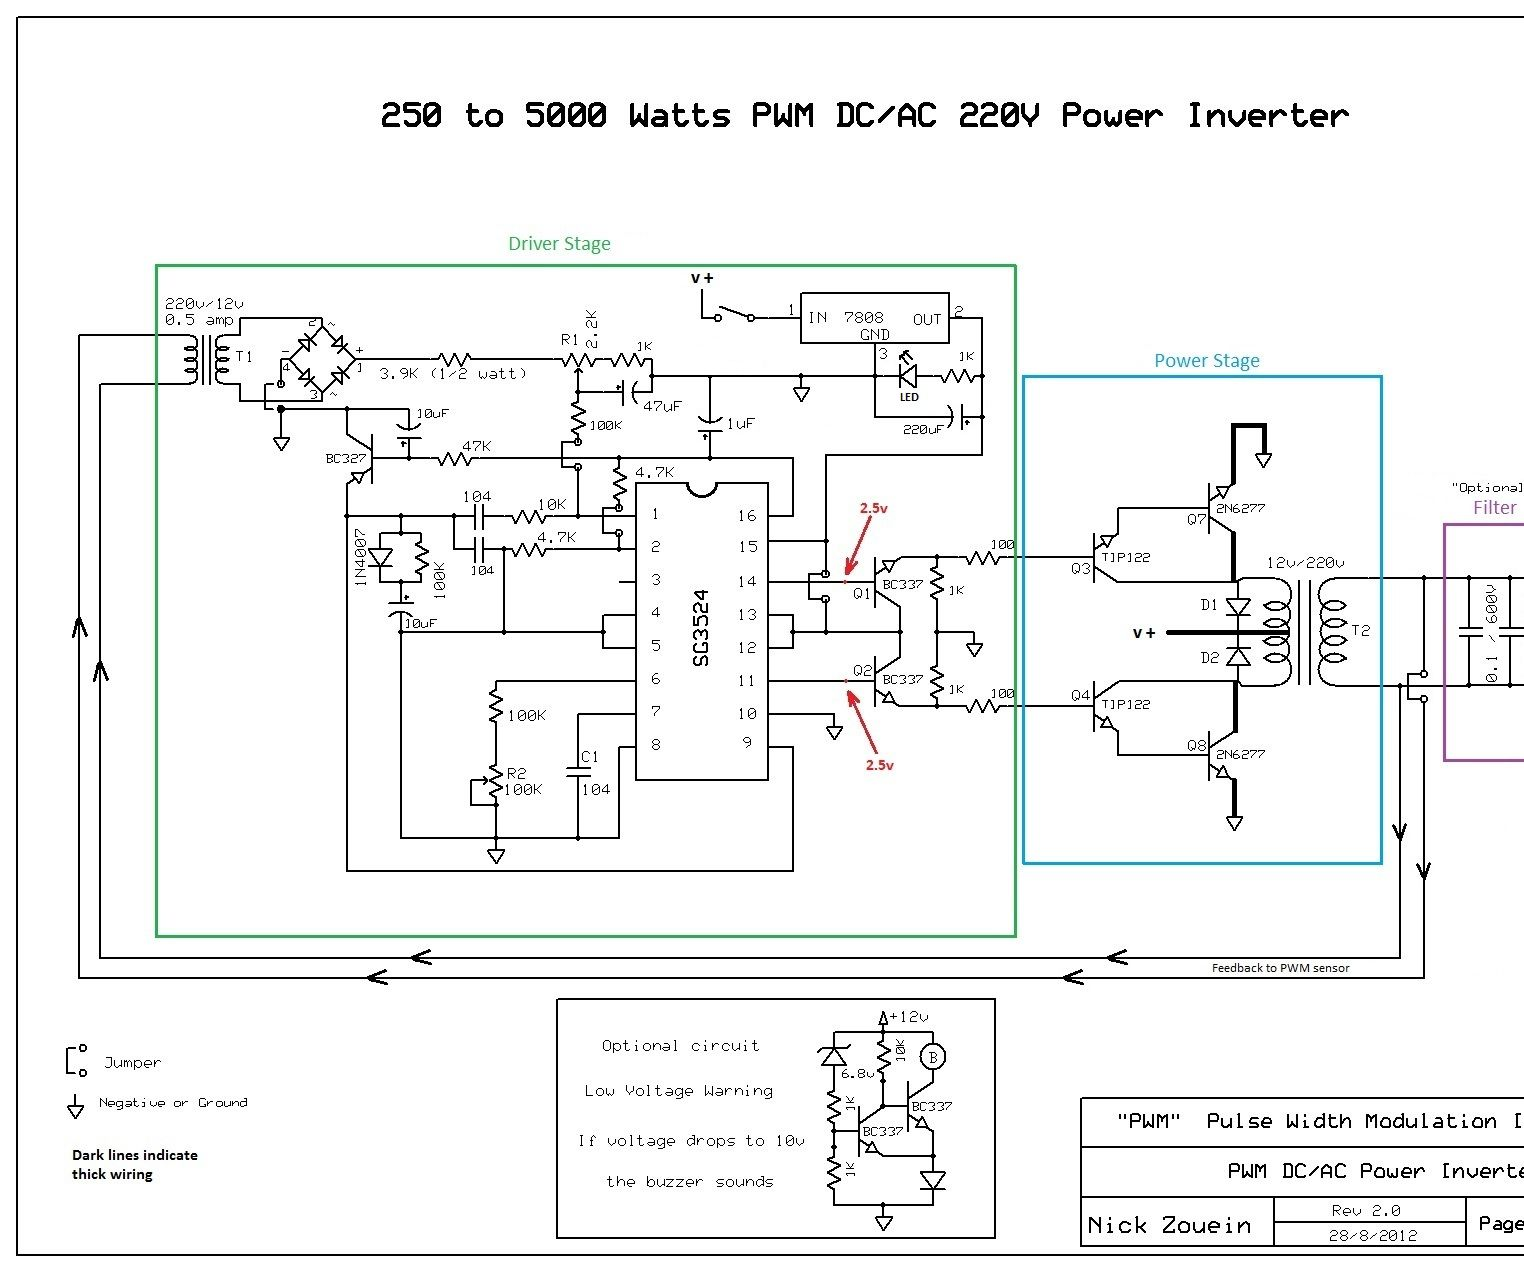 zer haier huf168pb wiring diagram wiring diagrams value zer haier huf168pb wiring diagram wiring library 250 to 5000 watts pwm dc ac 220v power